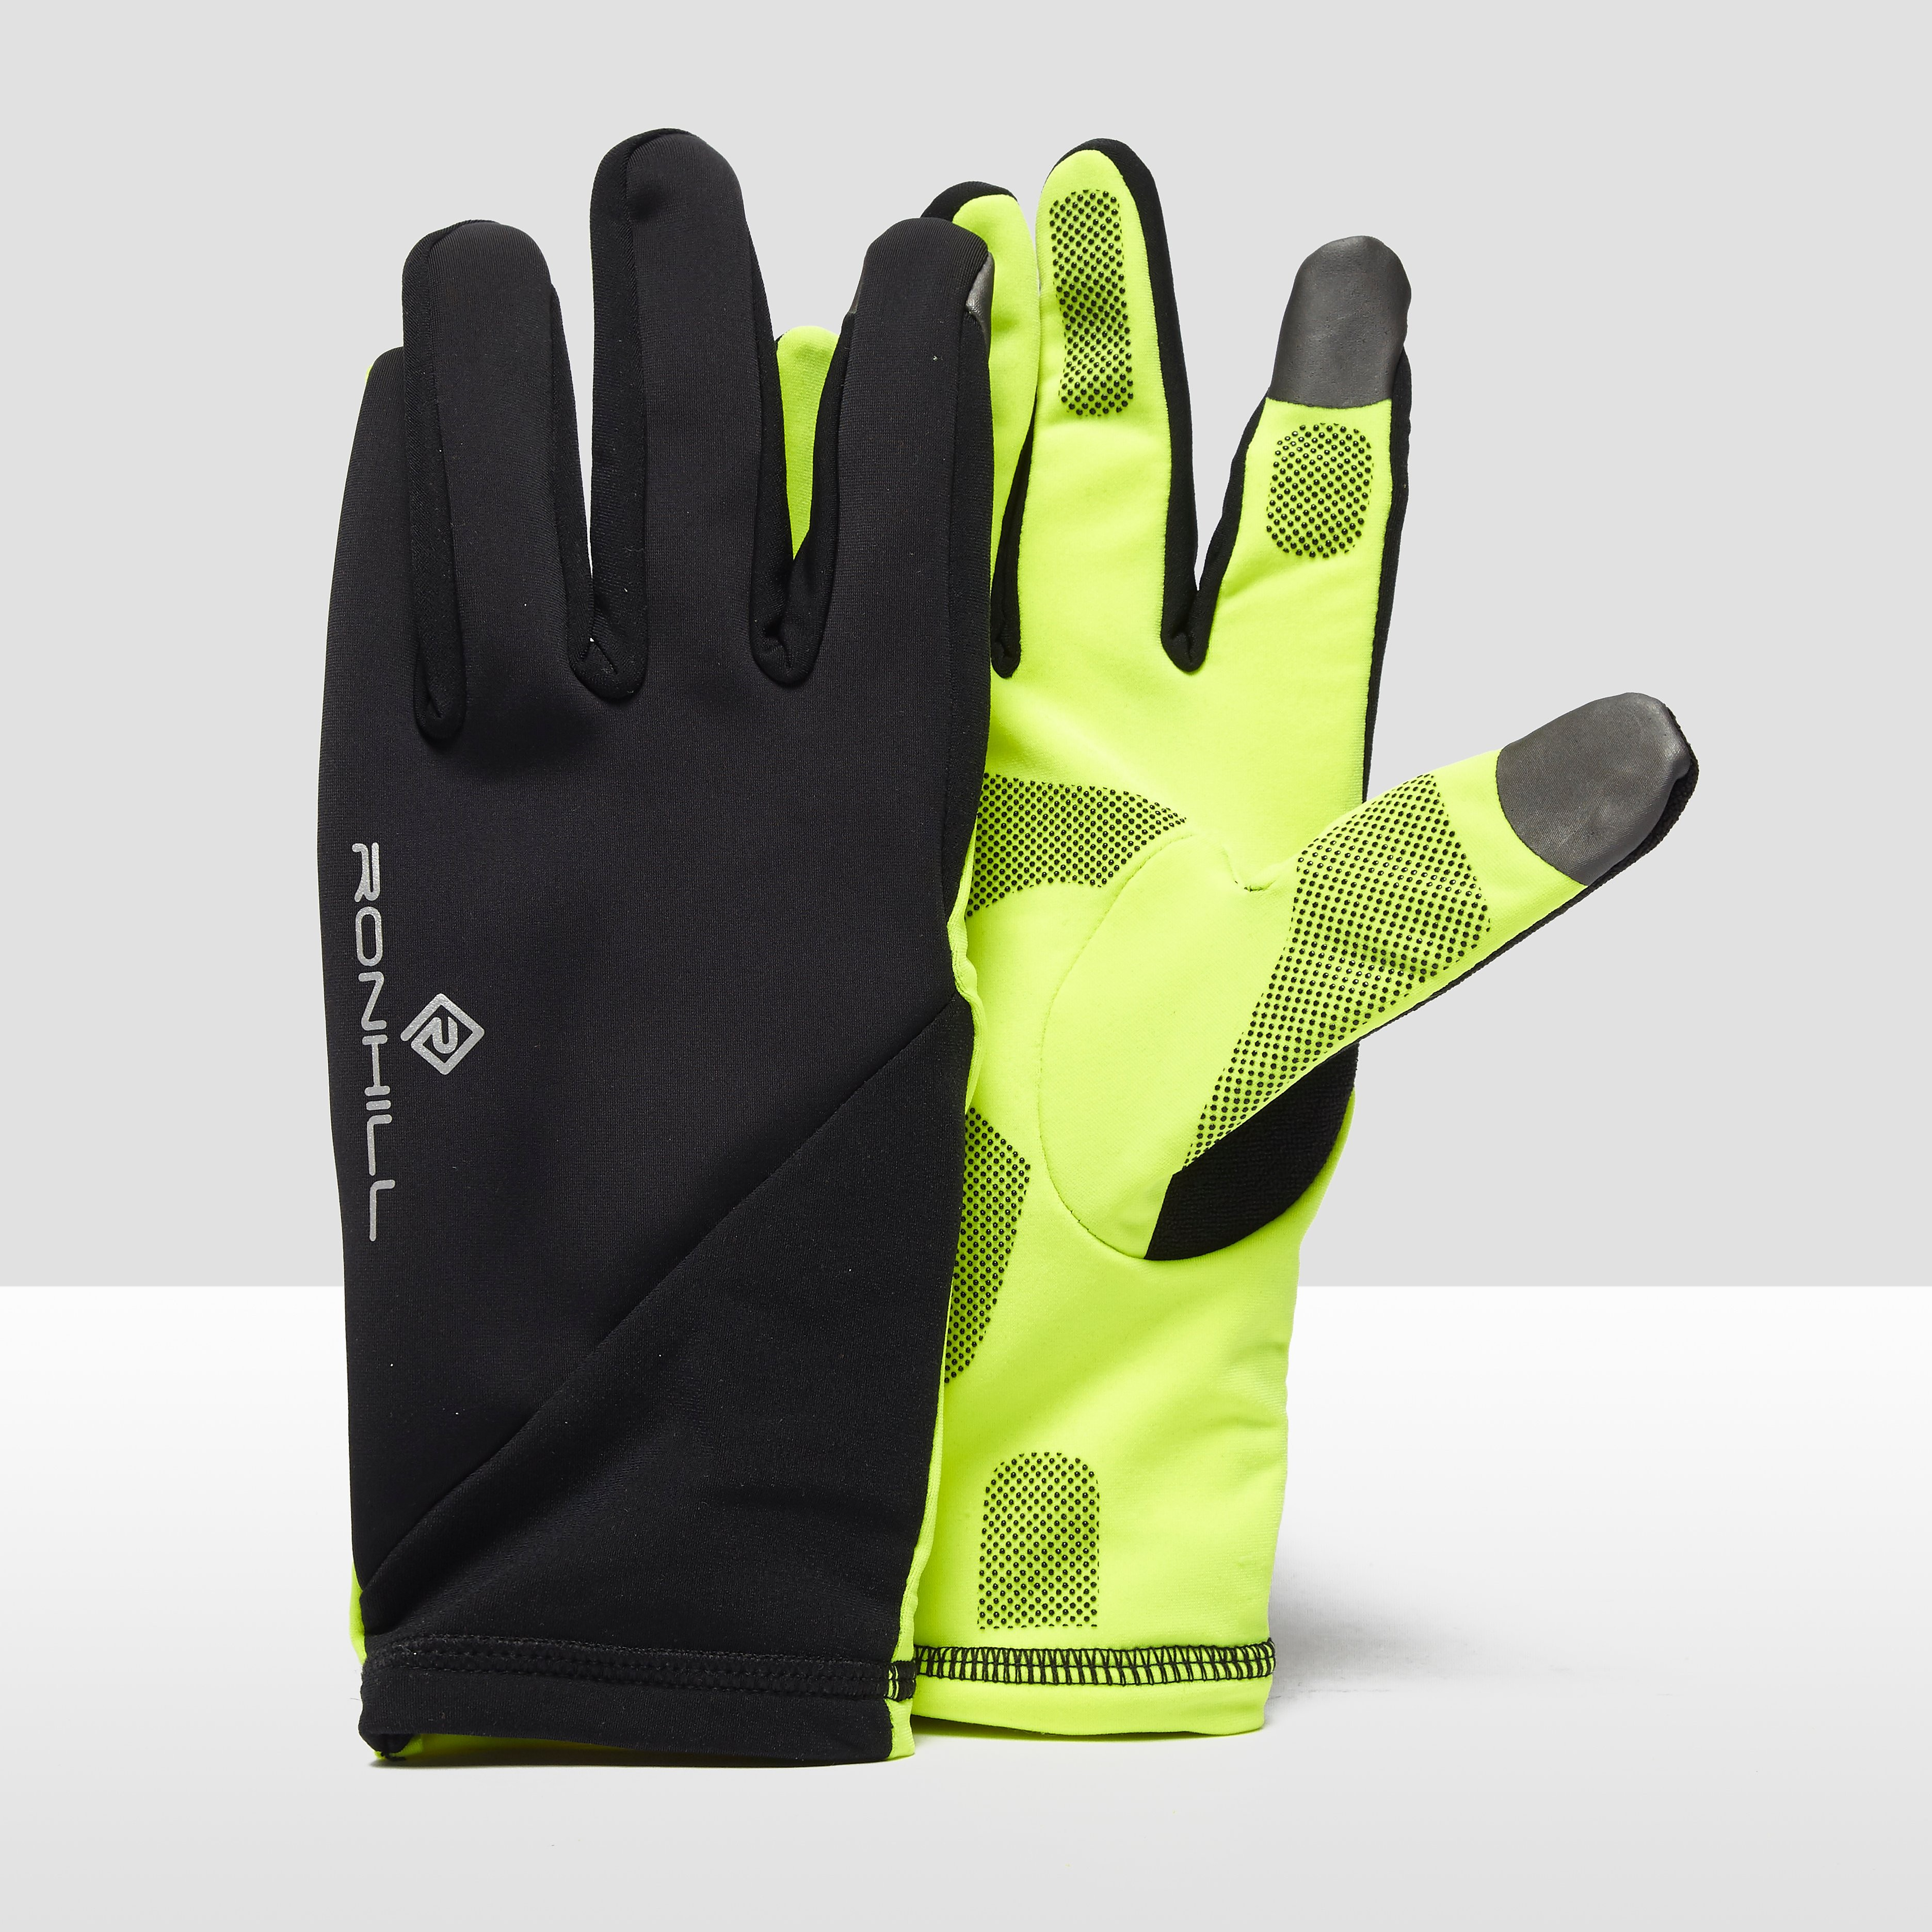 Ronhill Sirocco Running Gloves